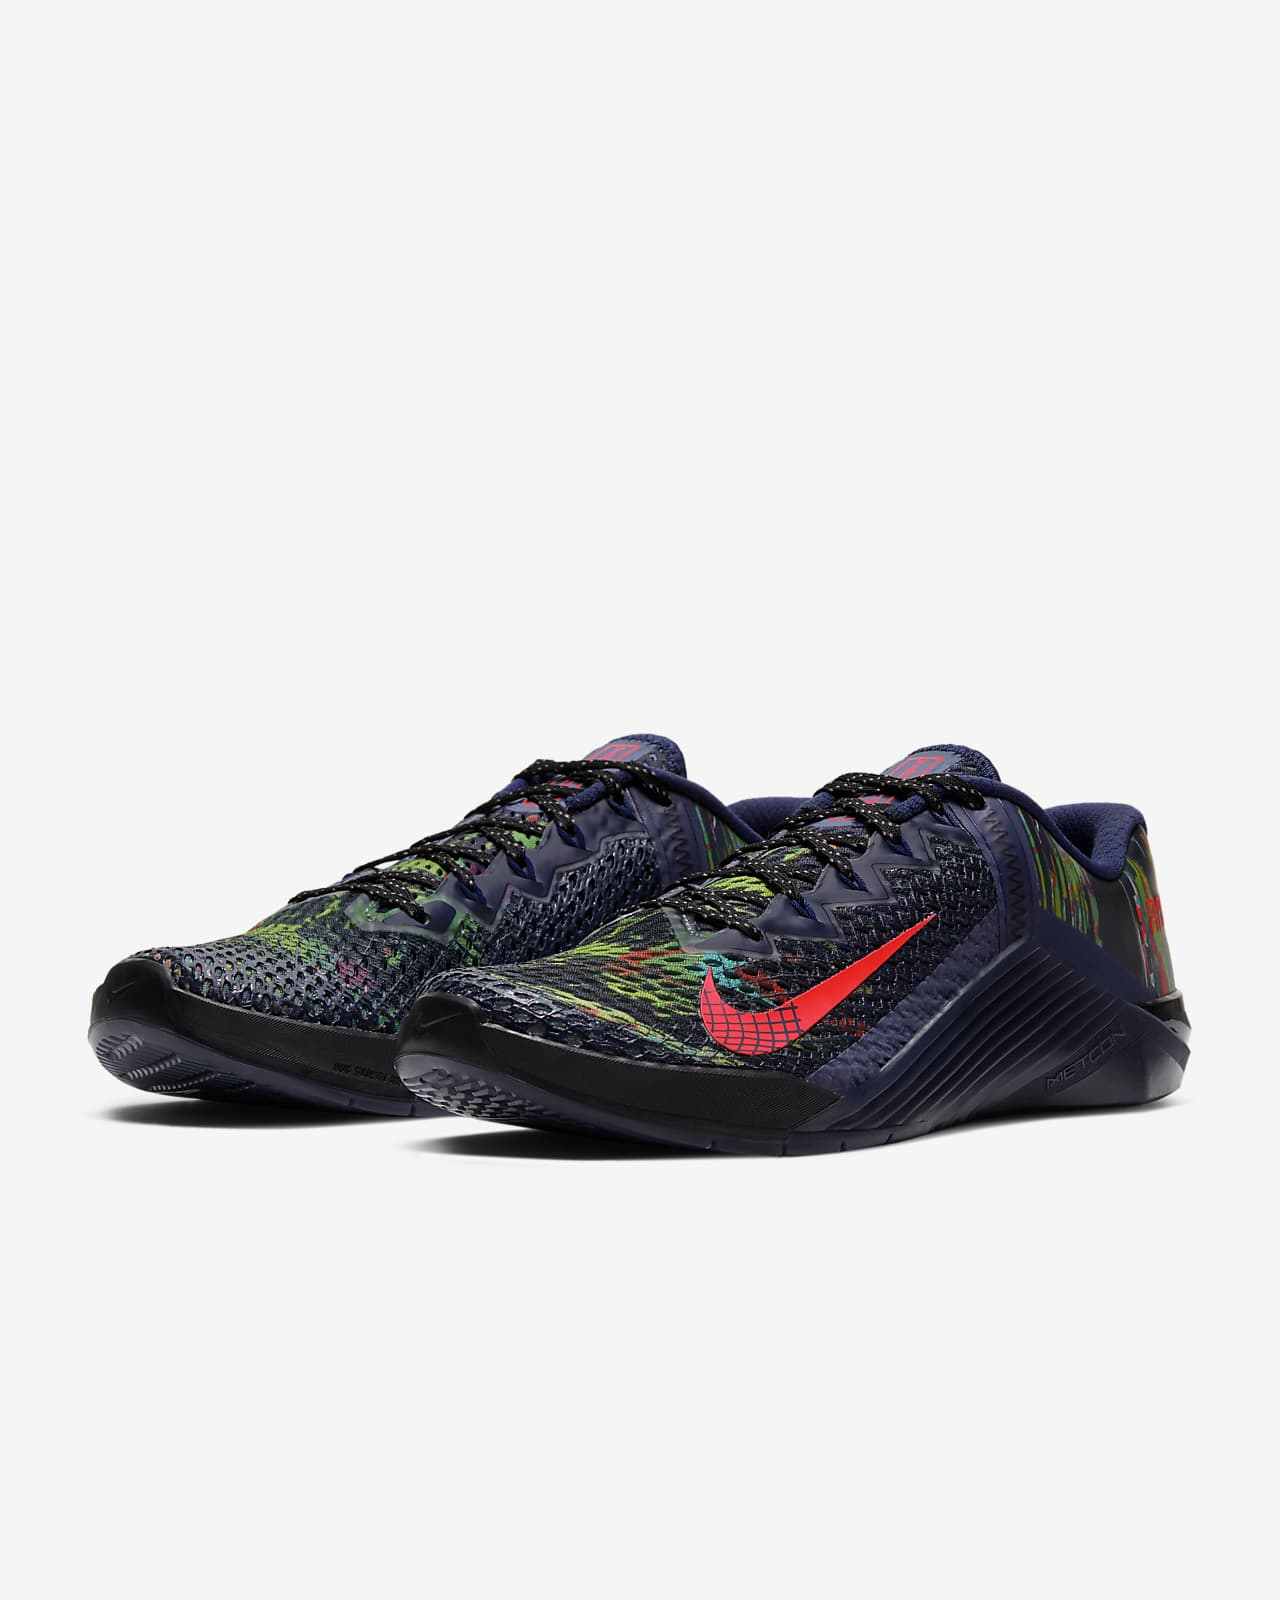 men's nike metcon shoes